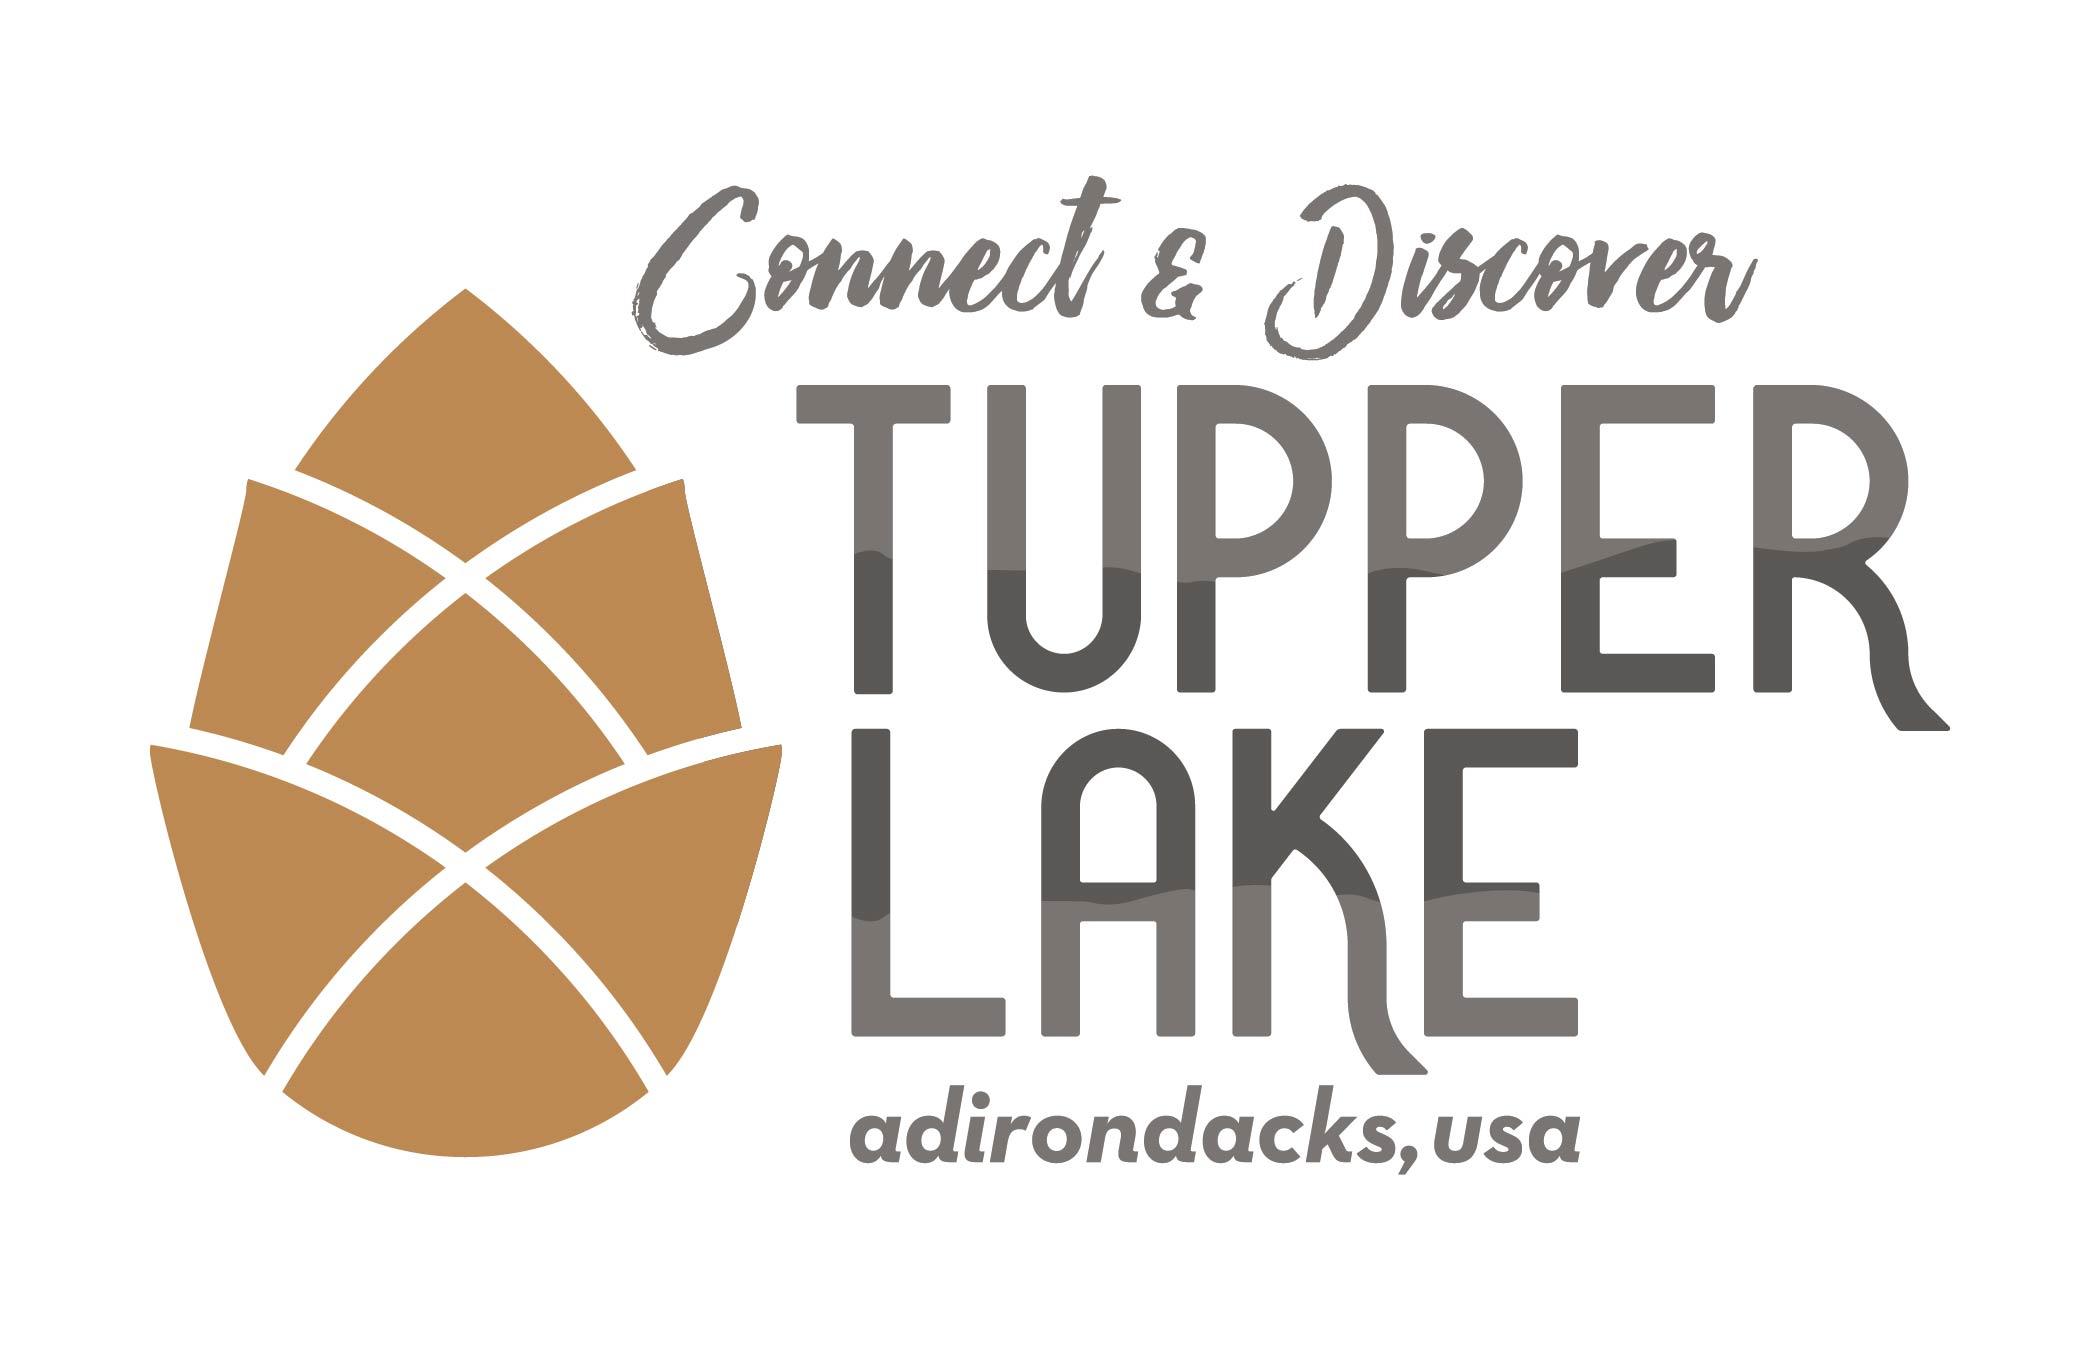 tupperlake.com